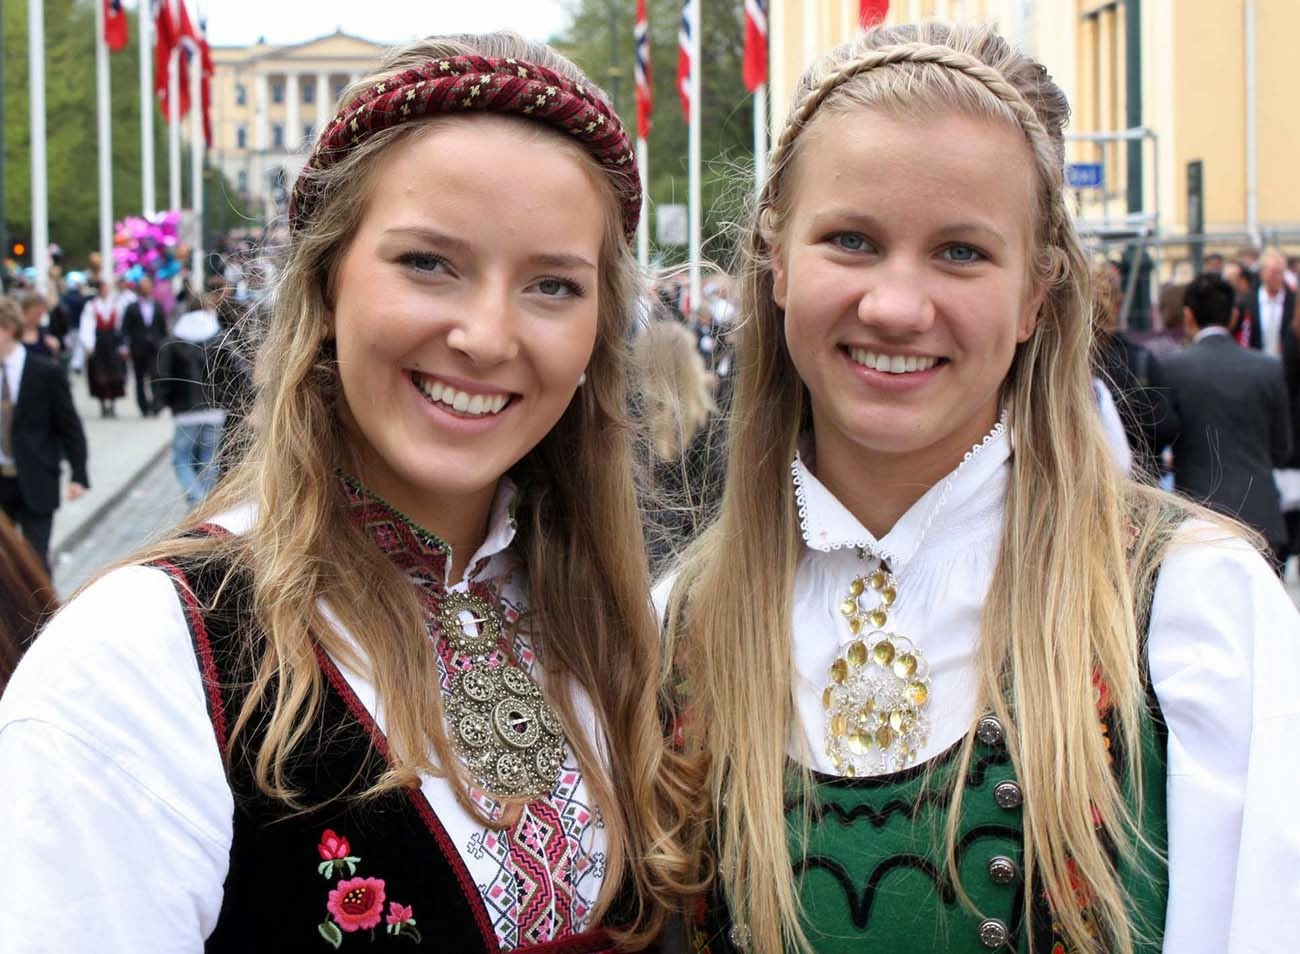 Norwegian Girl Havanna Winter is so Cute - Best Hot Girls